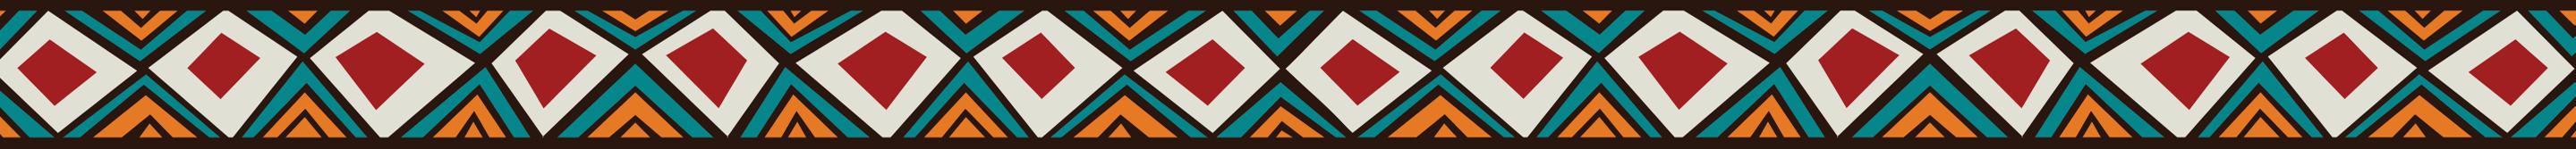 Illustration of African pattern